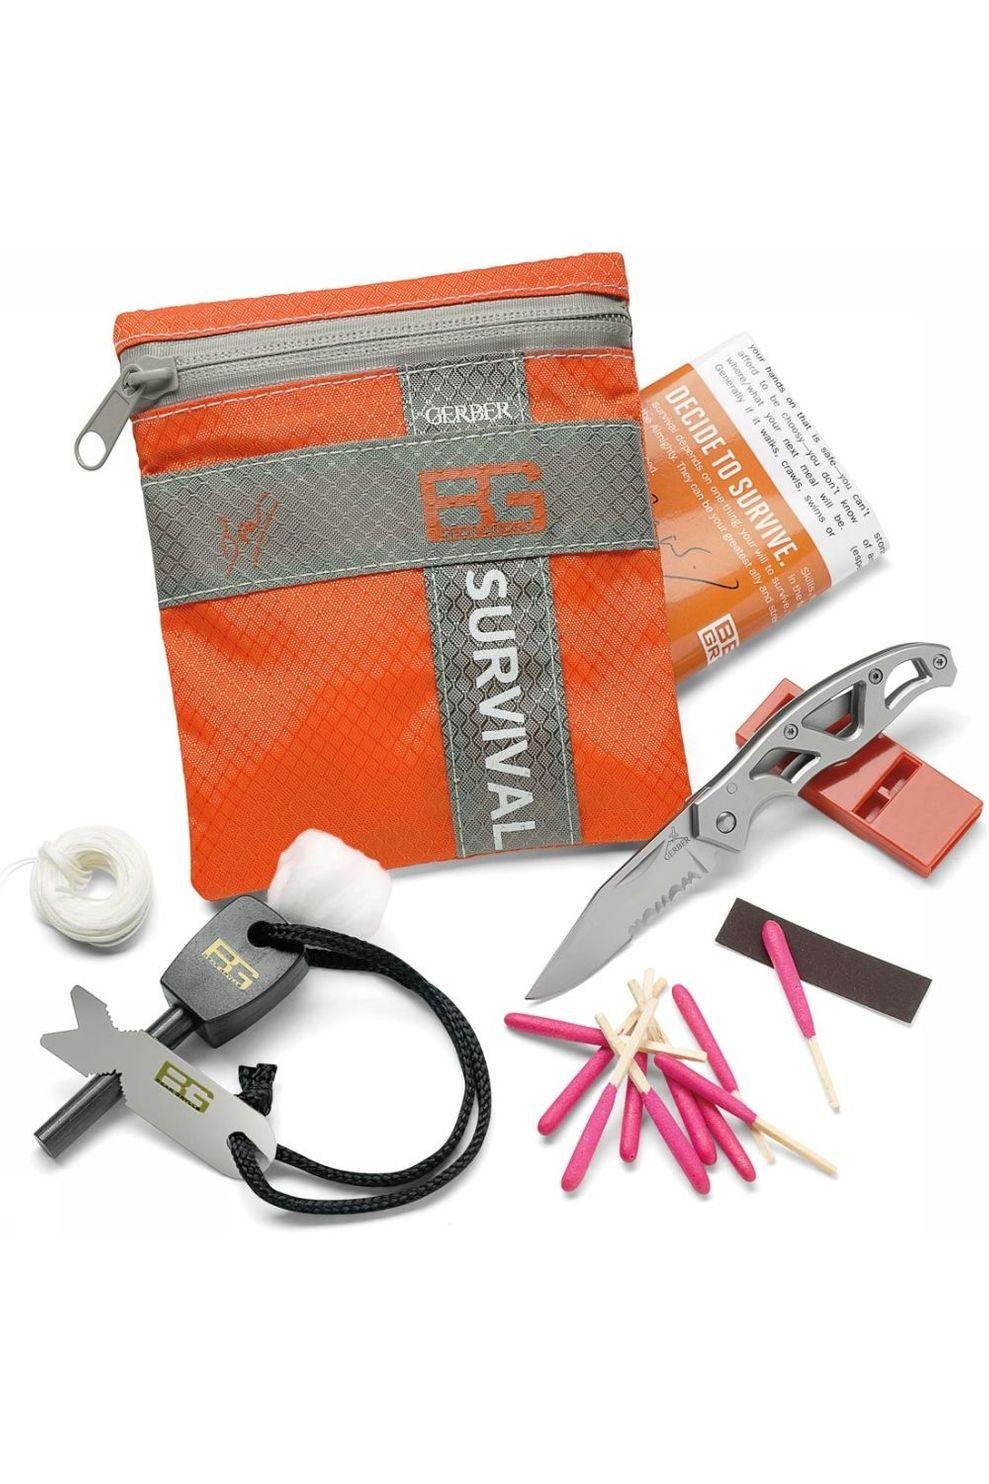 Gerber Survival Kit Basic Bear Grylls Oranje